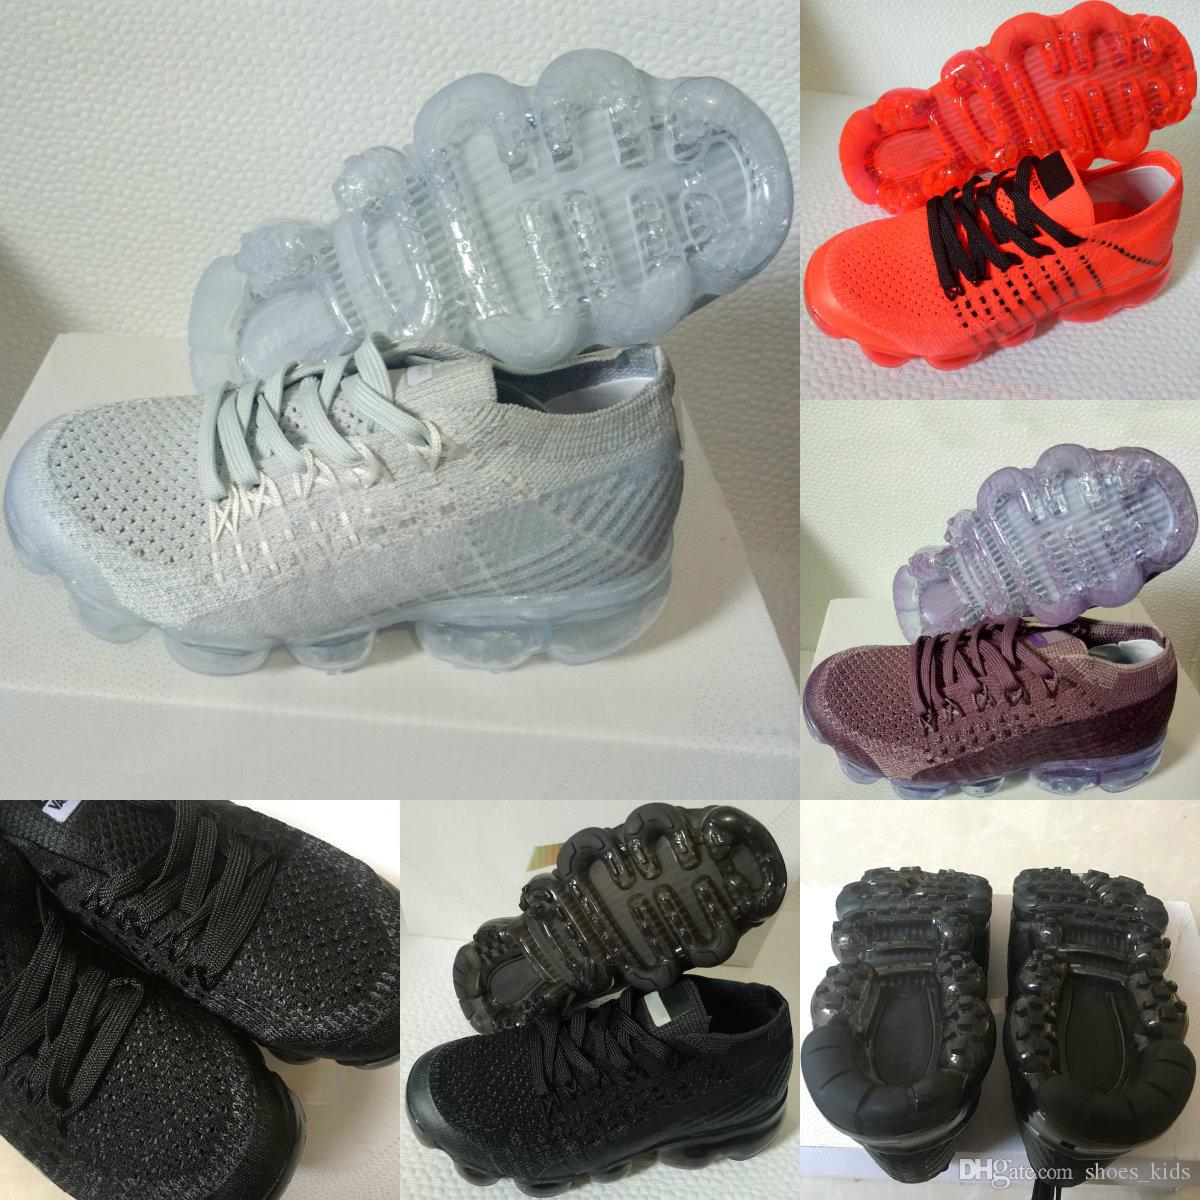 089a1fb3cbe4 Zoom Air 2018 VM Running Shoes Children Athletic Shoes Boys Girls ...